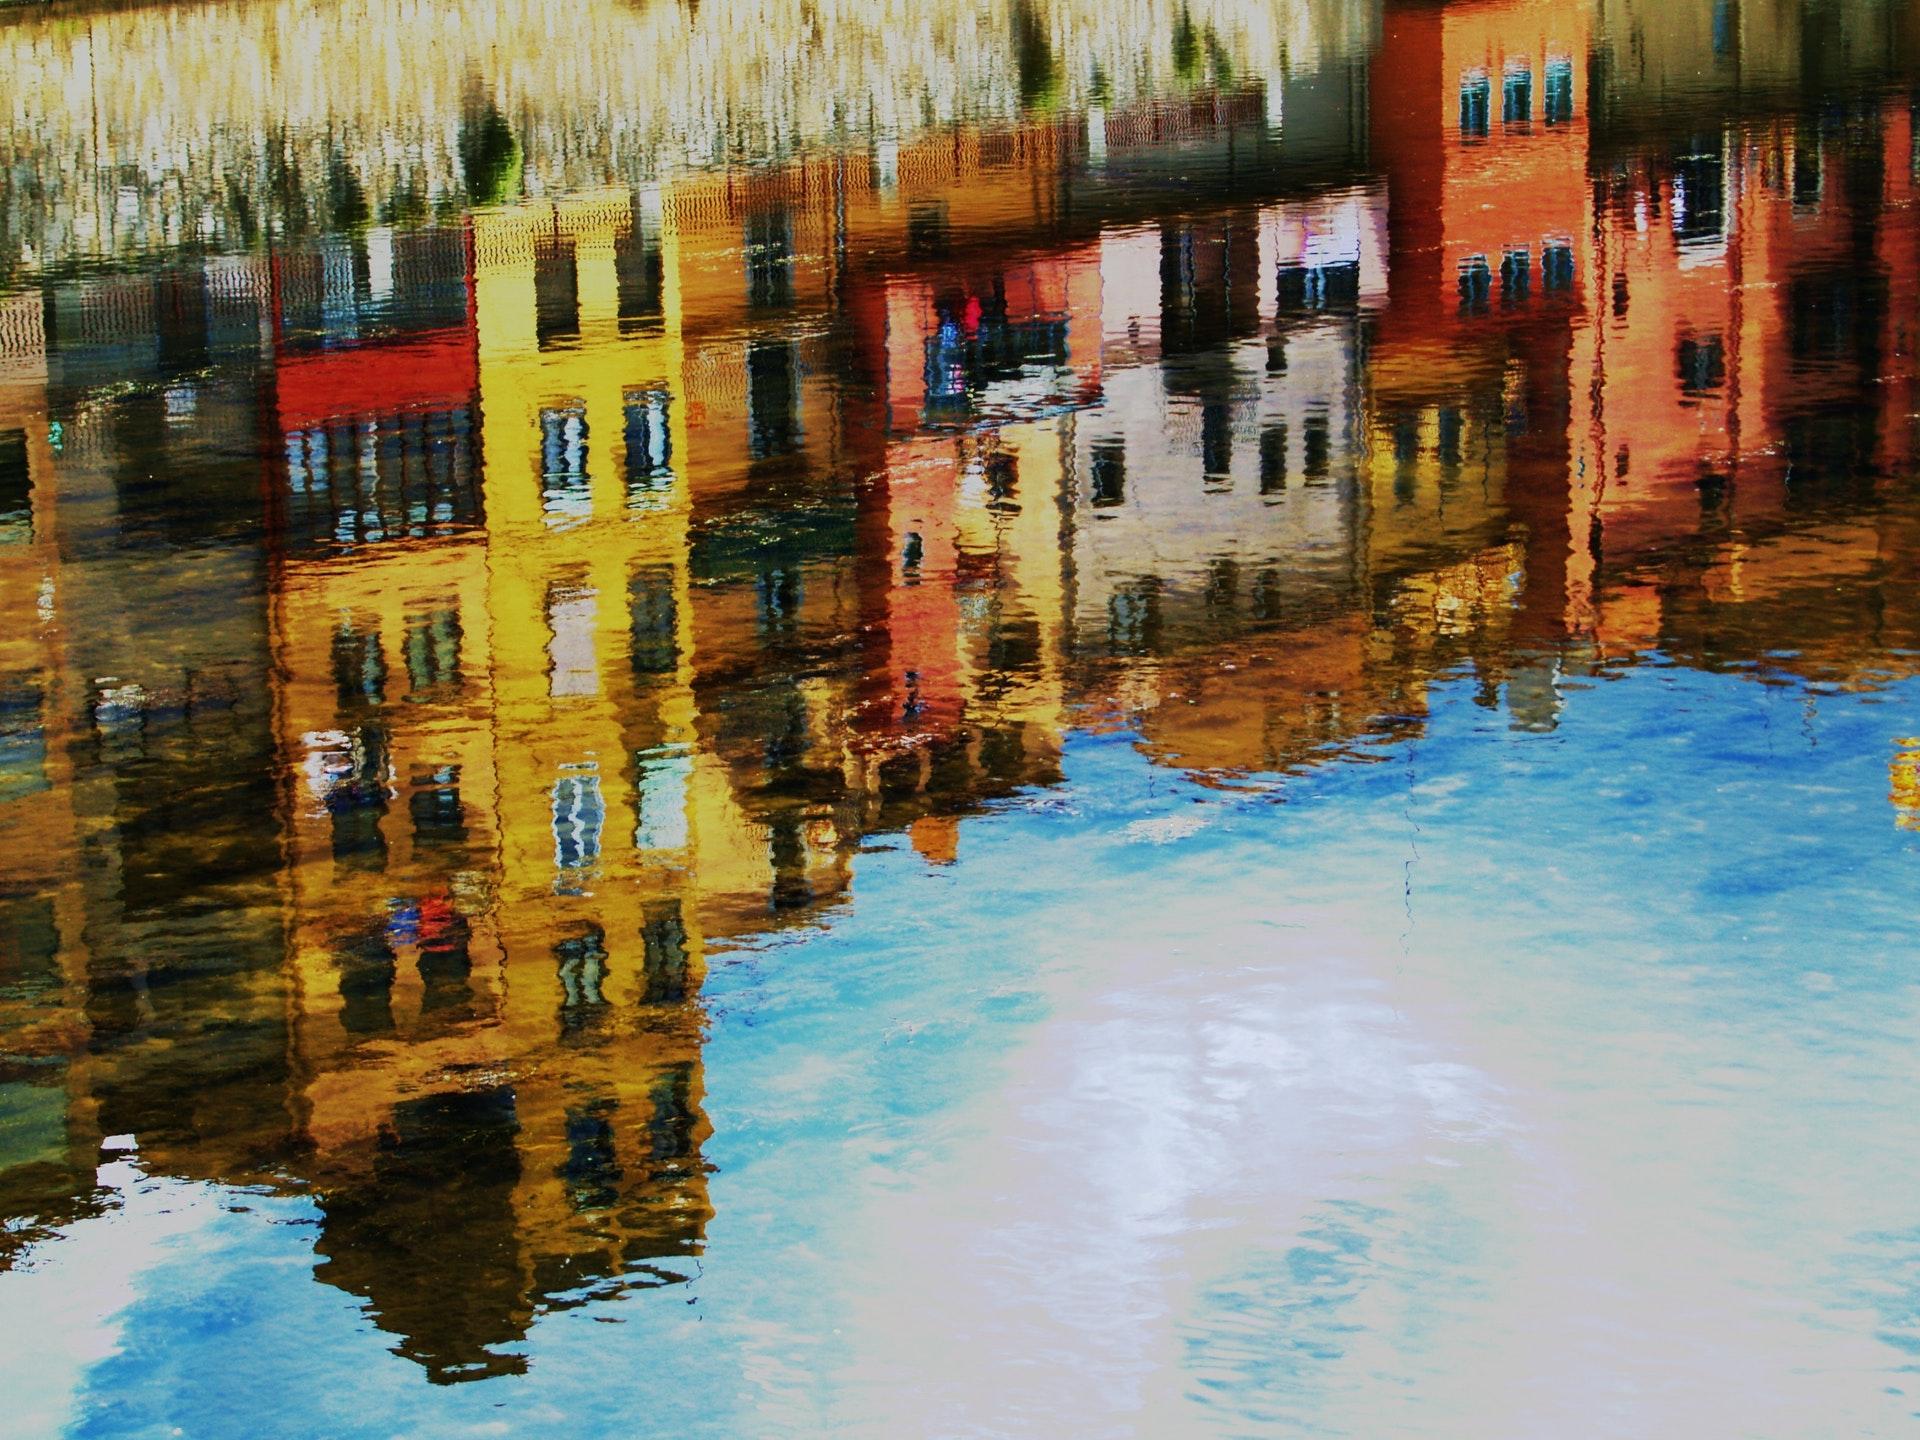 pexels-photo-164455.jpeg